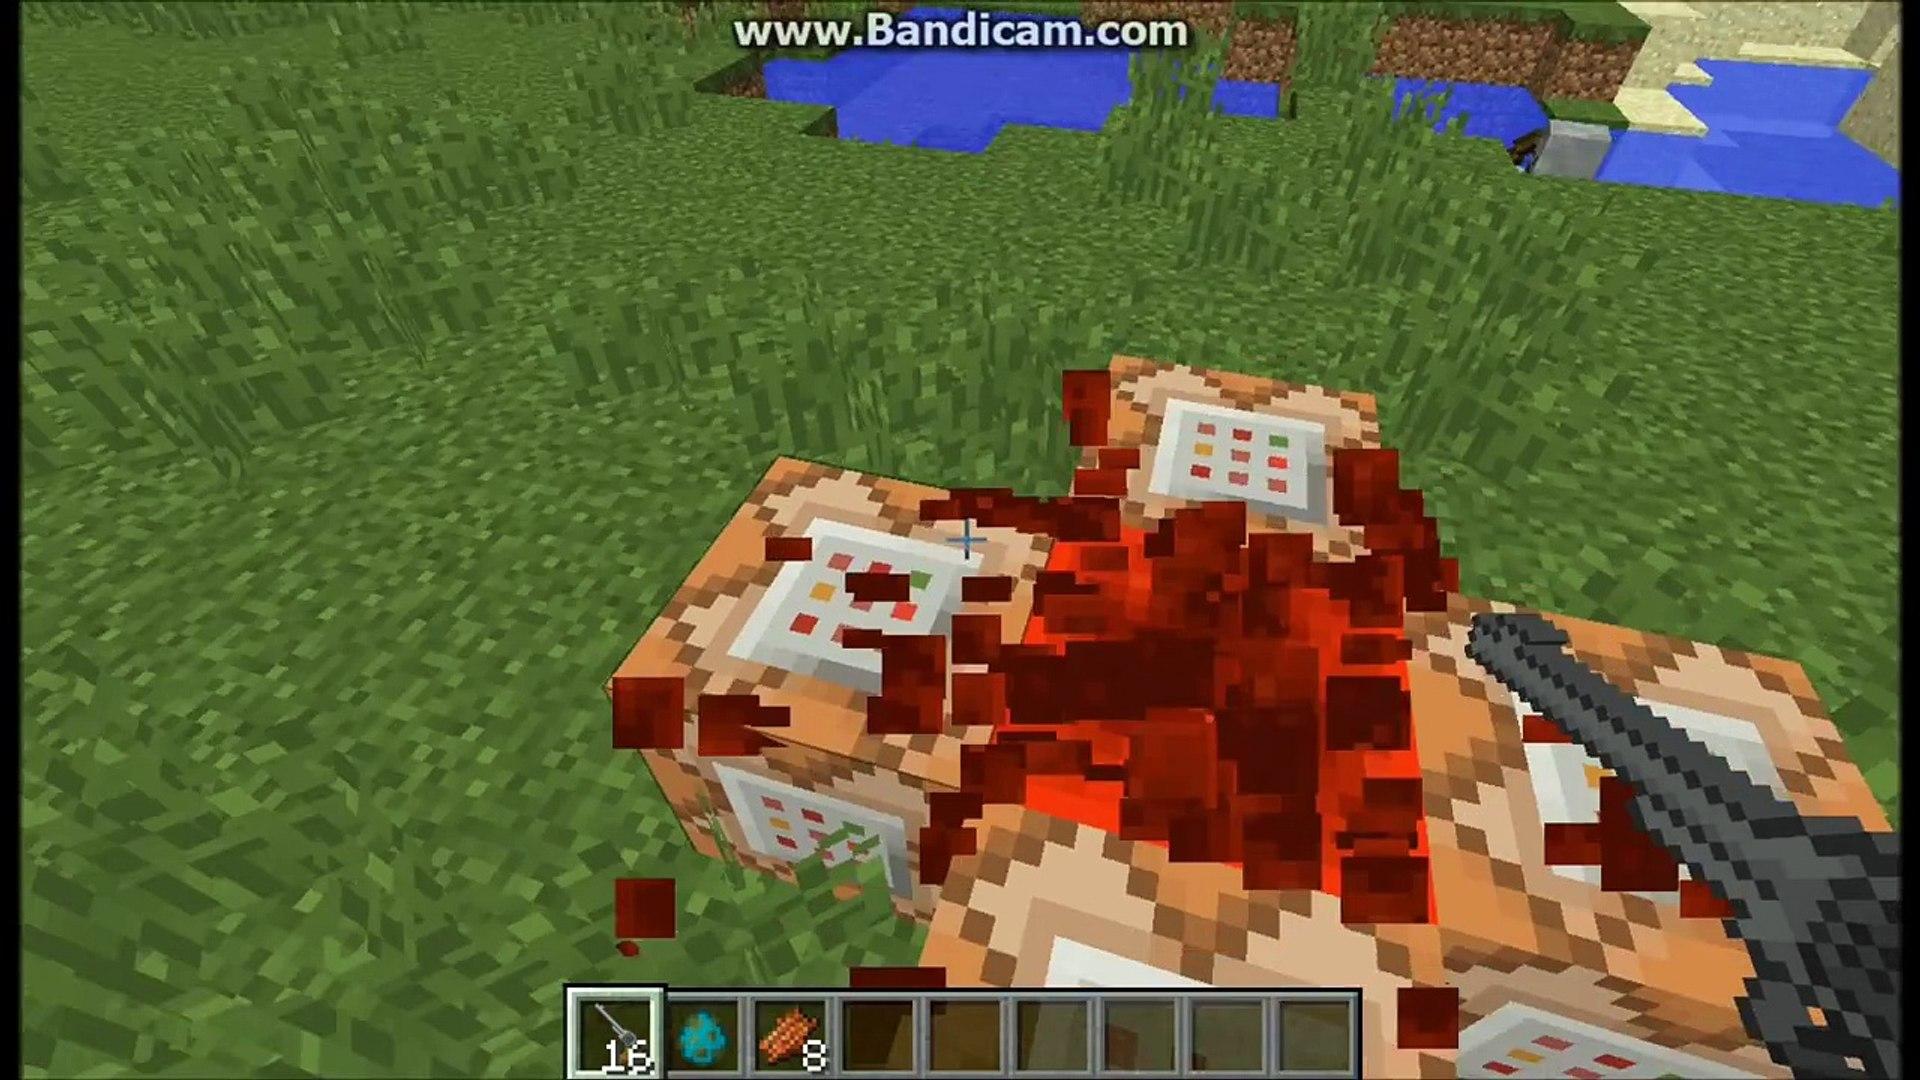 Minecraft: WORKING GUNS with 5 command blocks [1 8 1] (No mods)